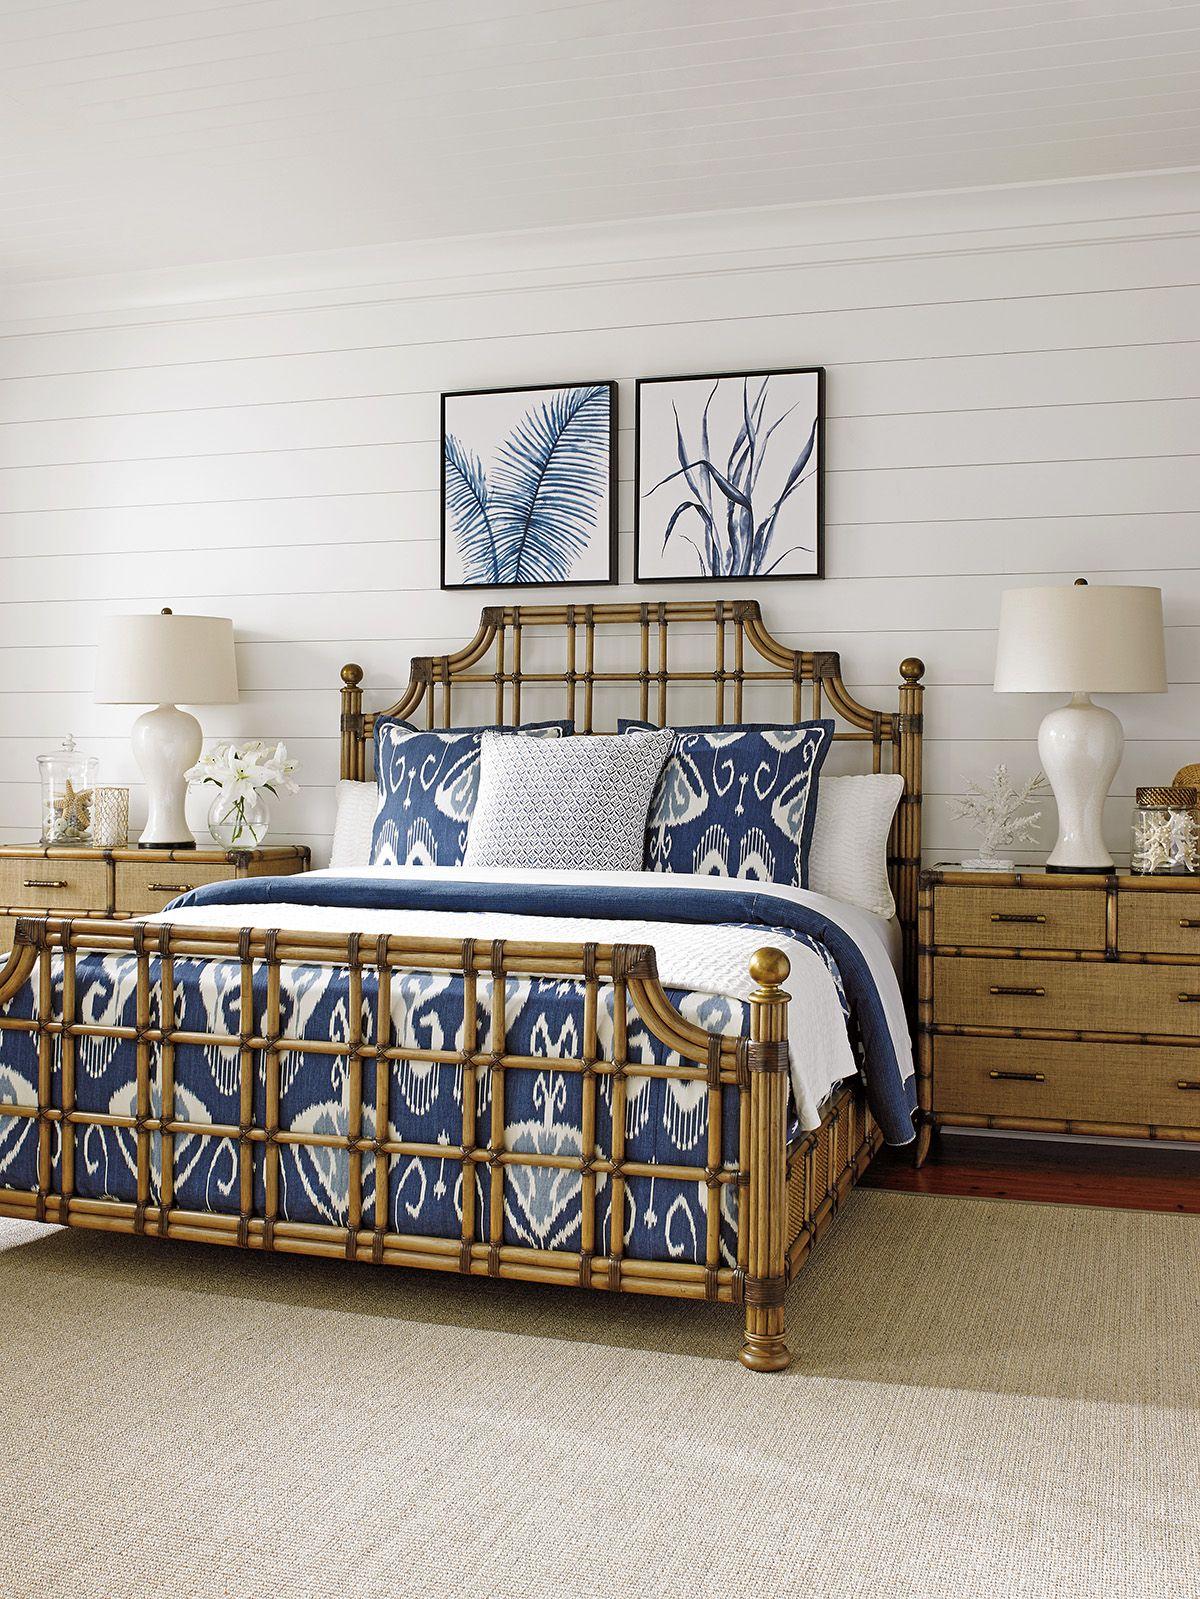 Blue and White Bedroom BeachHouse TommyBahamaHome